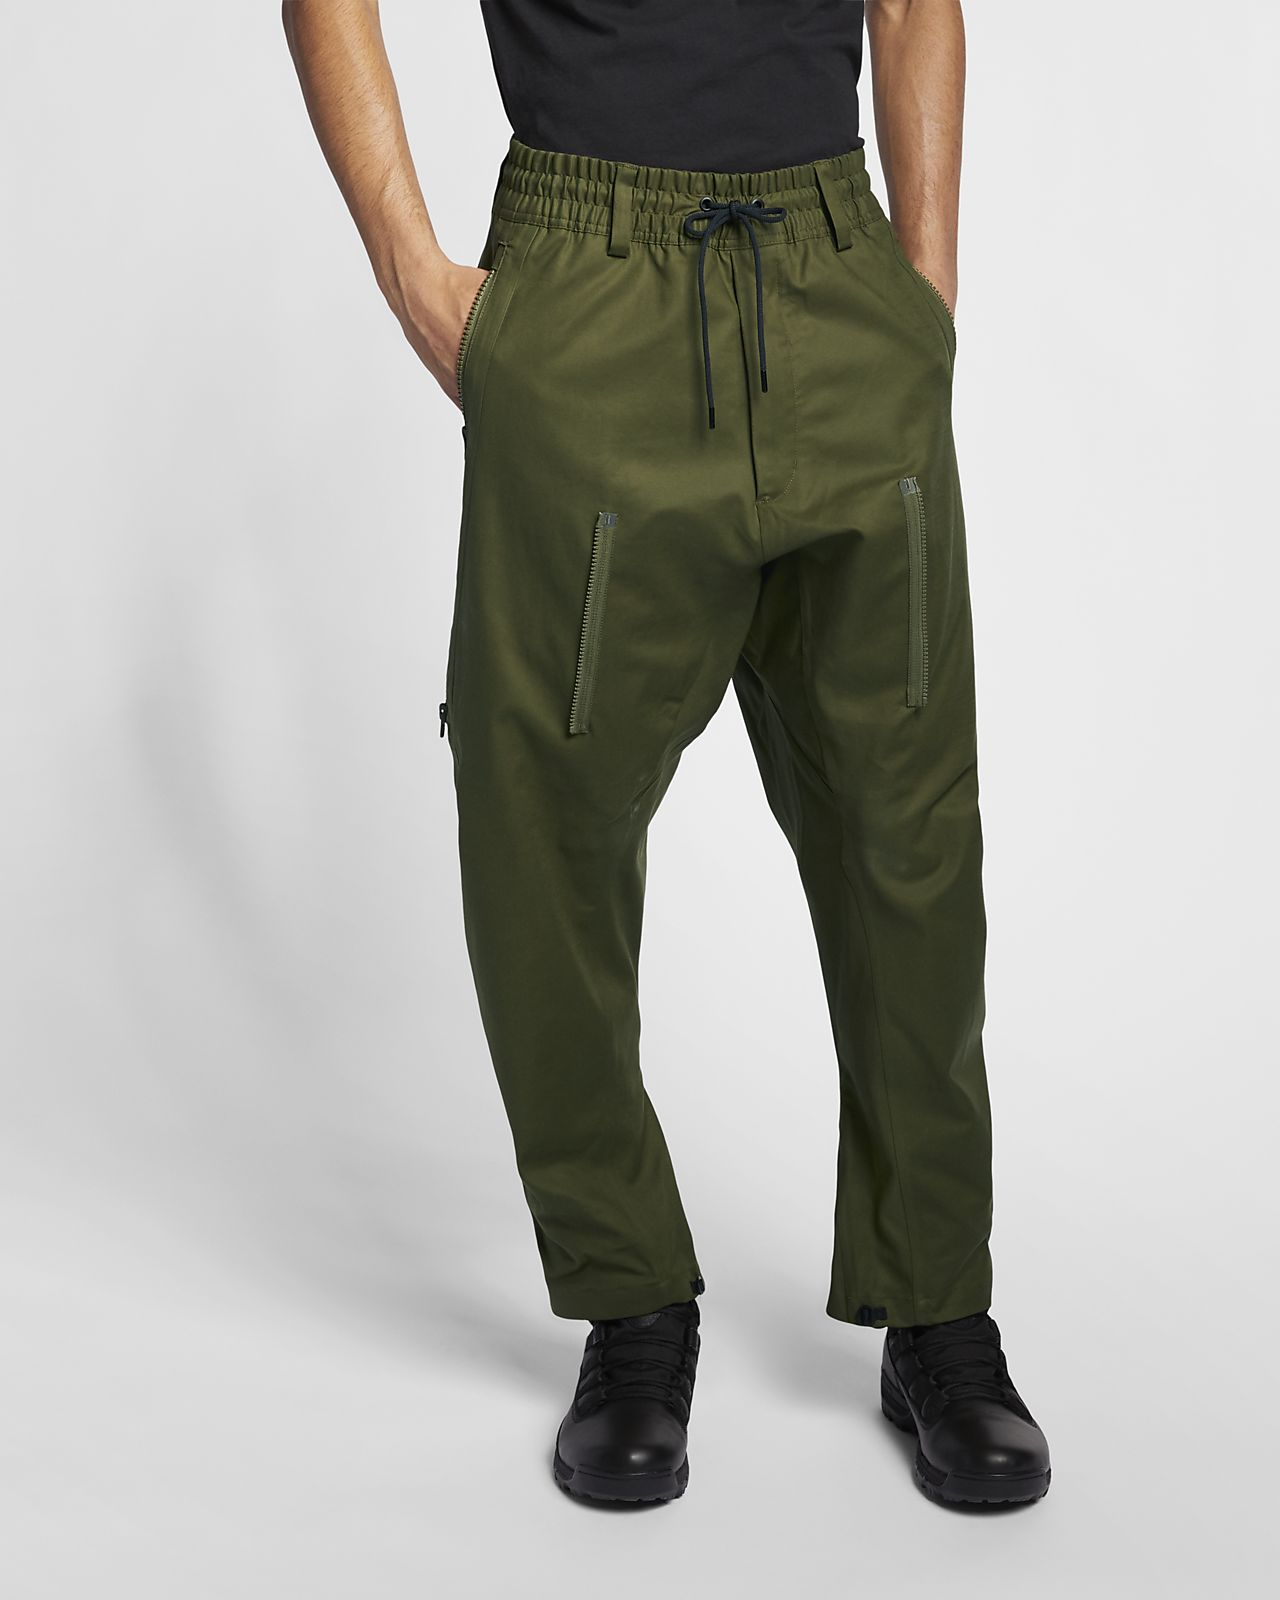 NikeLab ACG Men s Cargo Pants. Nike.com 4a3794acd6aa